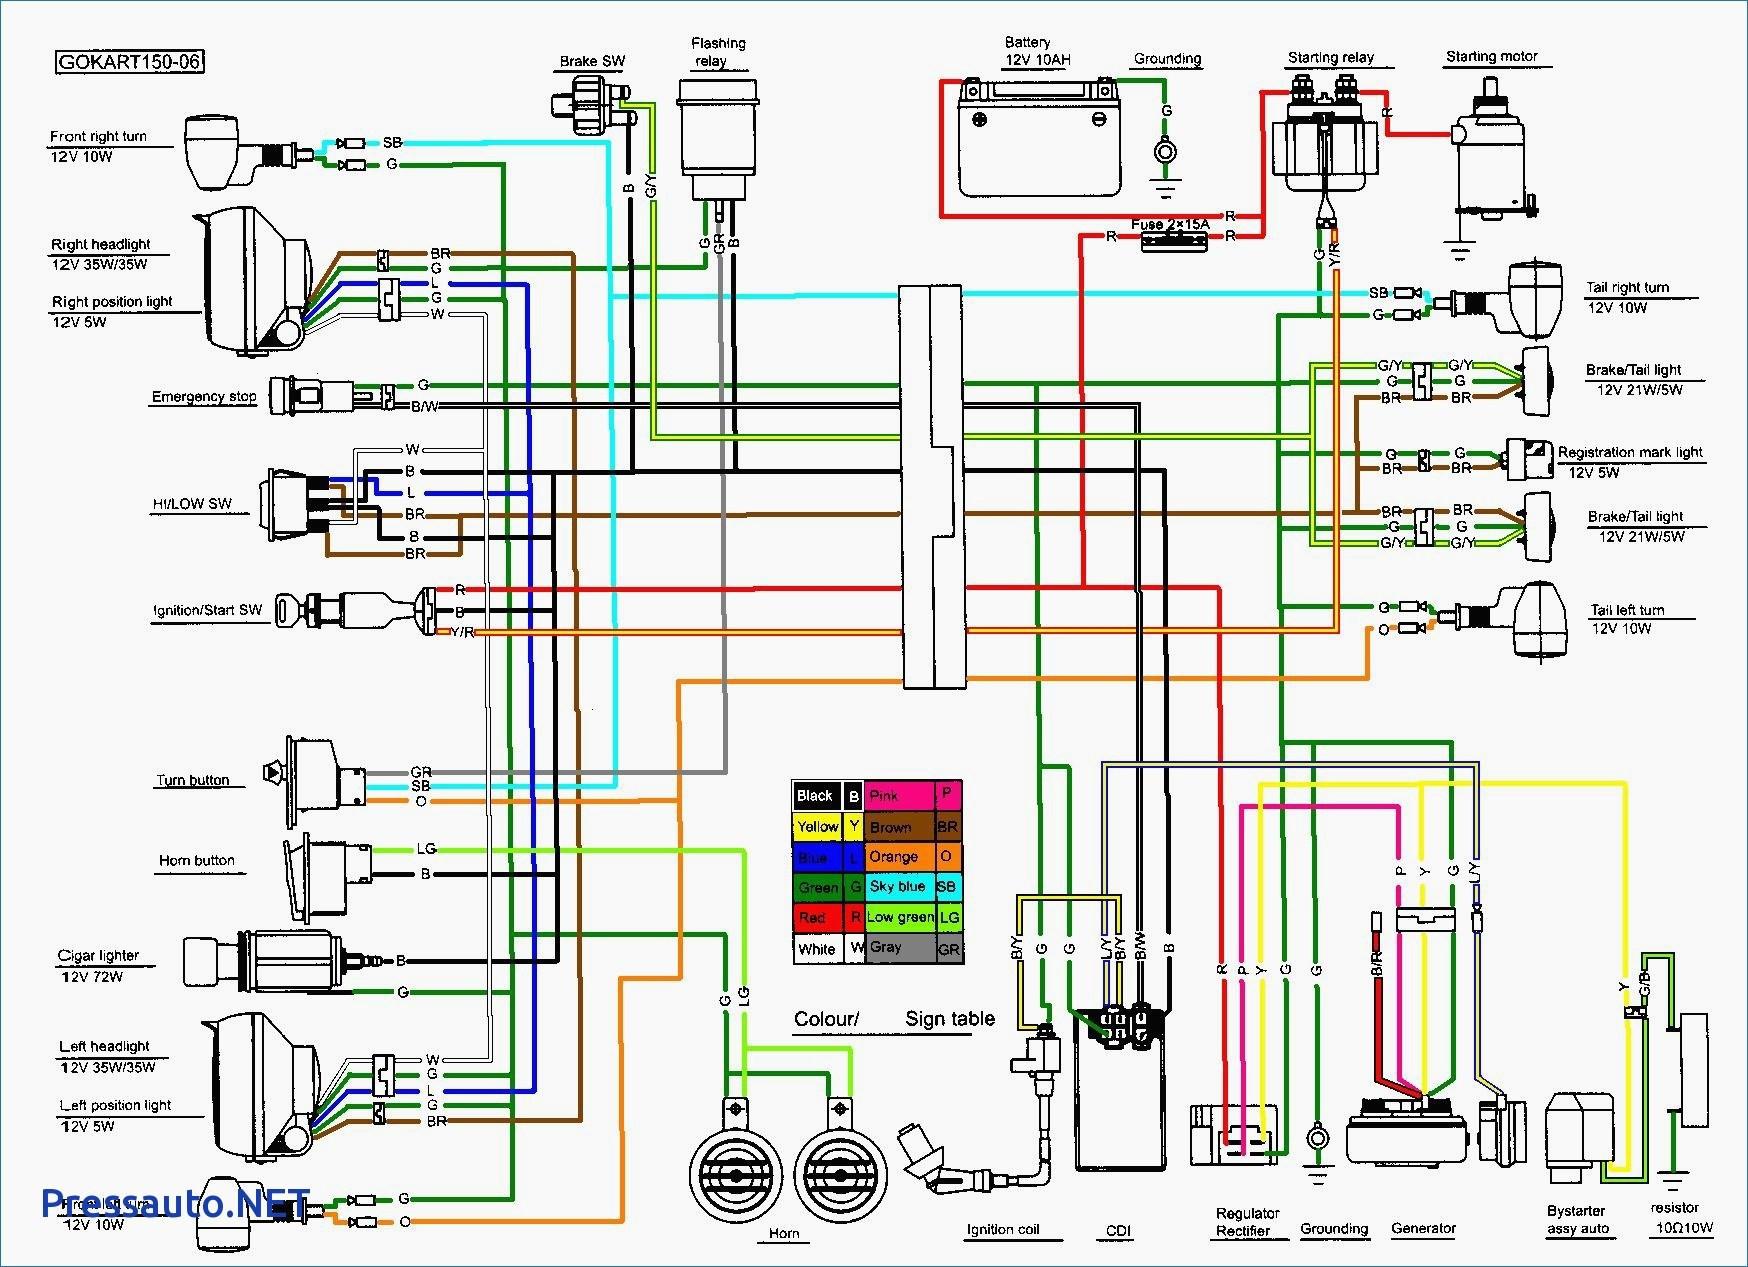 Chinese Atv Starter Solenoid Wiring Diagram | Wiring Diagram - Atv Starter Solenoid Wiring Diagram